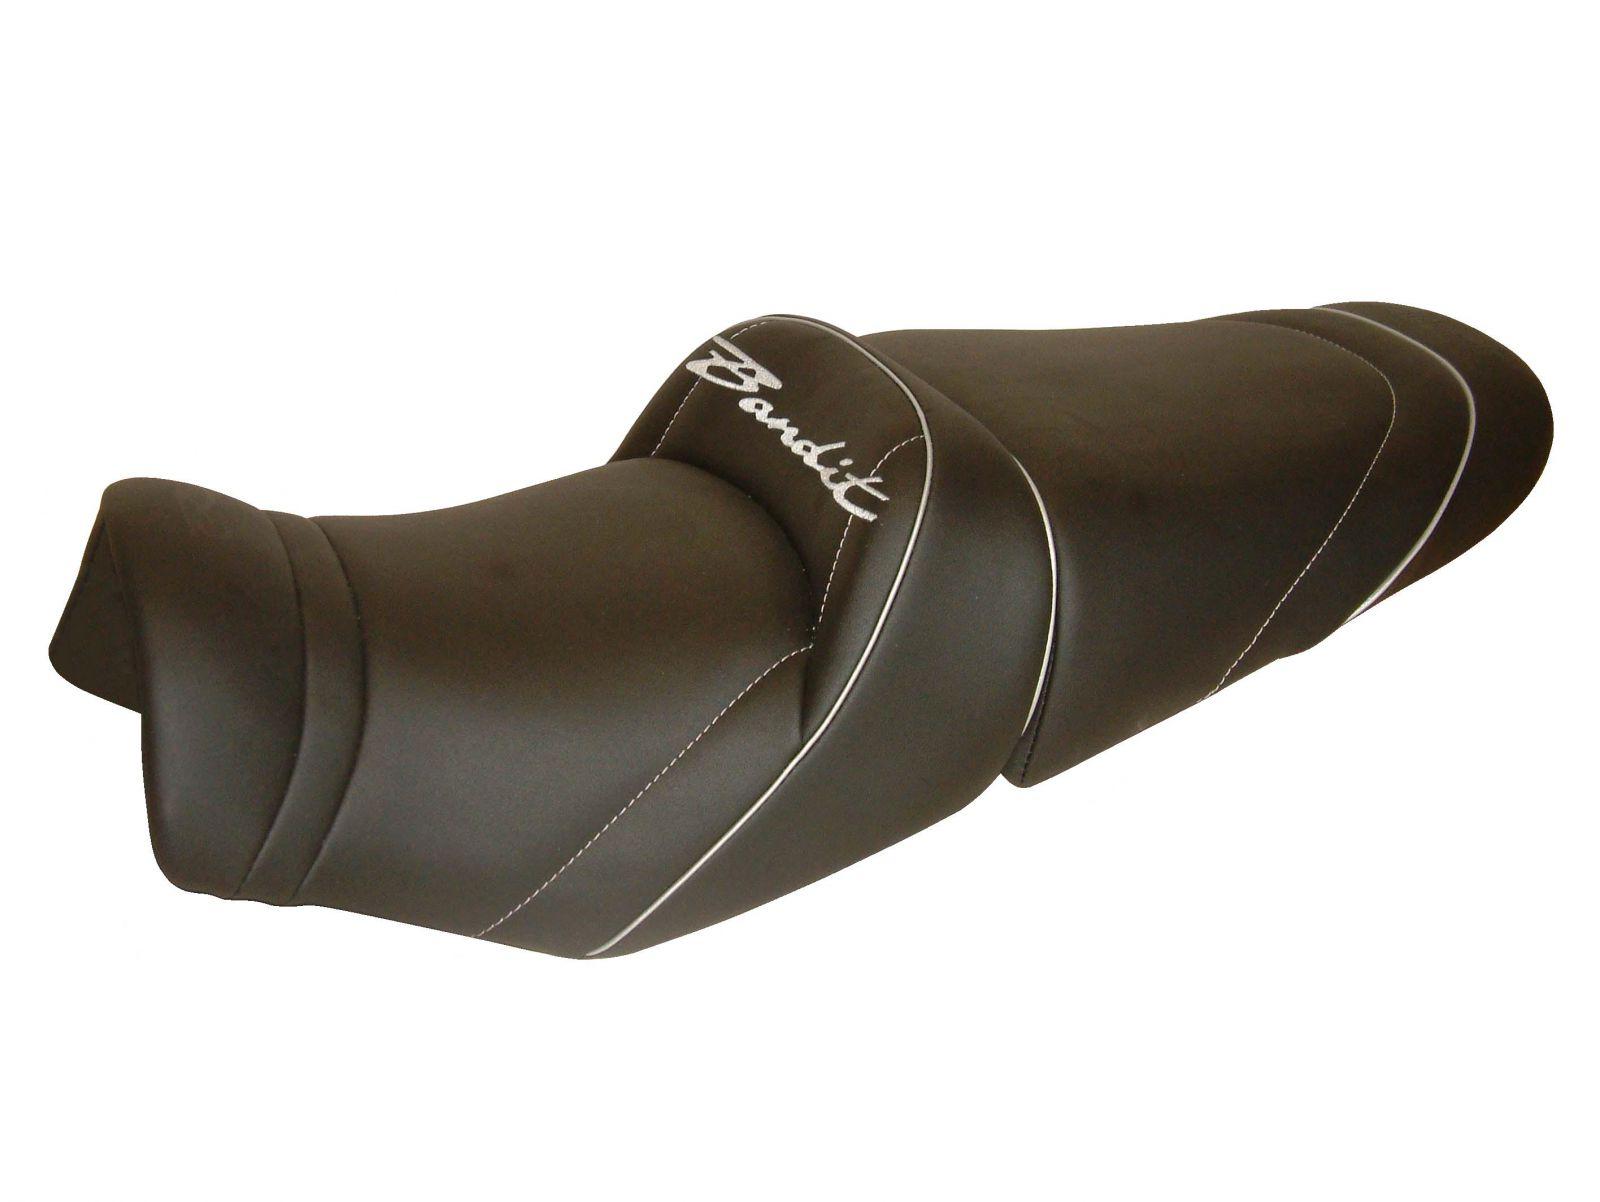 selle grand confort sgc3311 suzuki bandit 650 2010 tarifs pour france. Black Bedroom Furniture Sets. Home Design Ideas